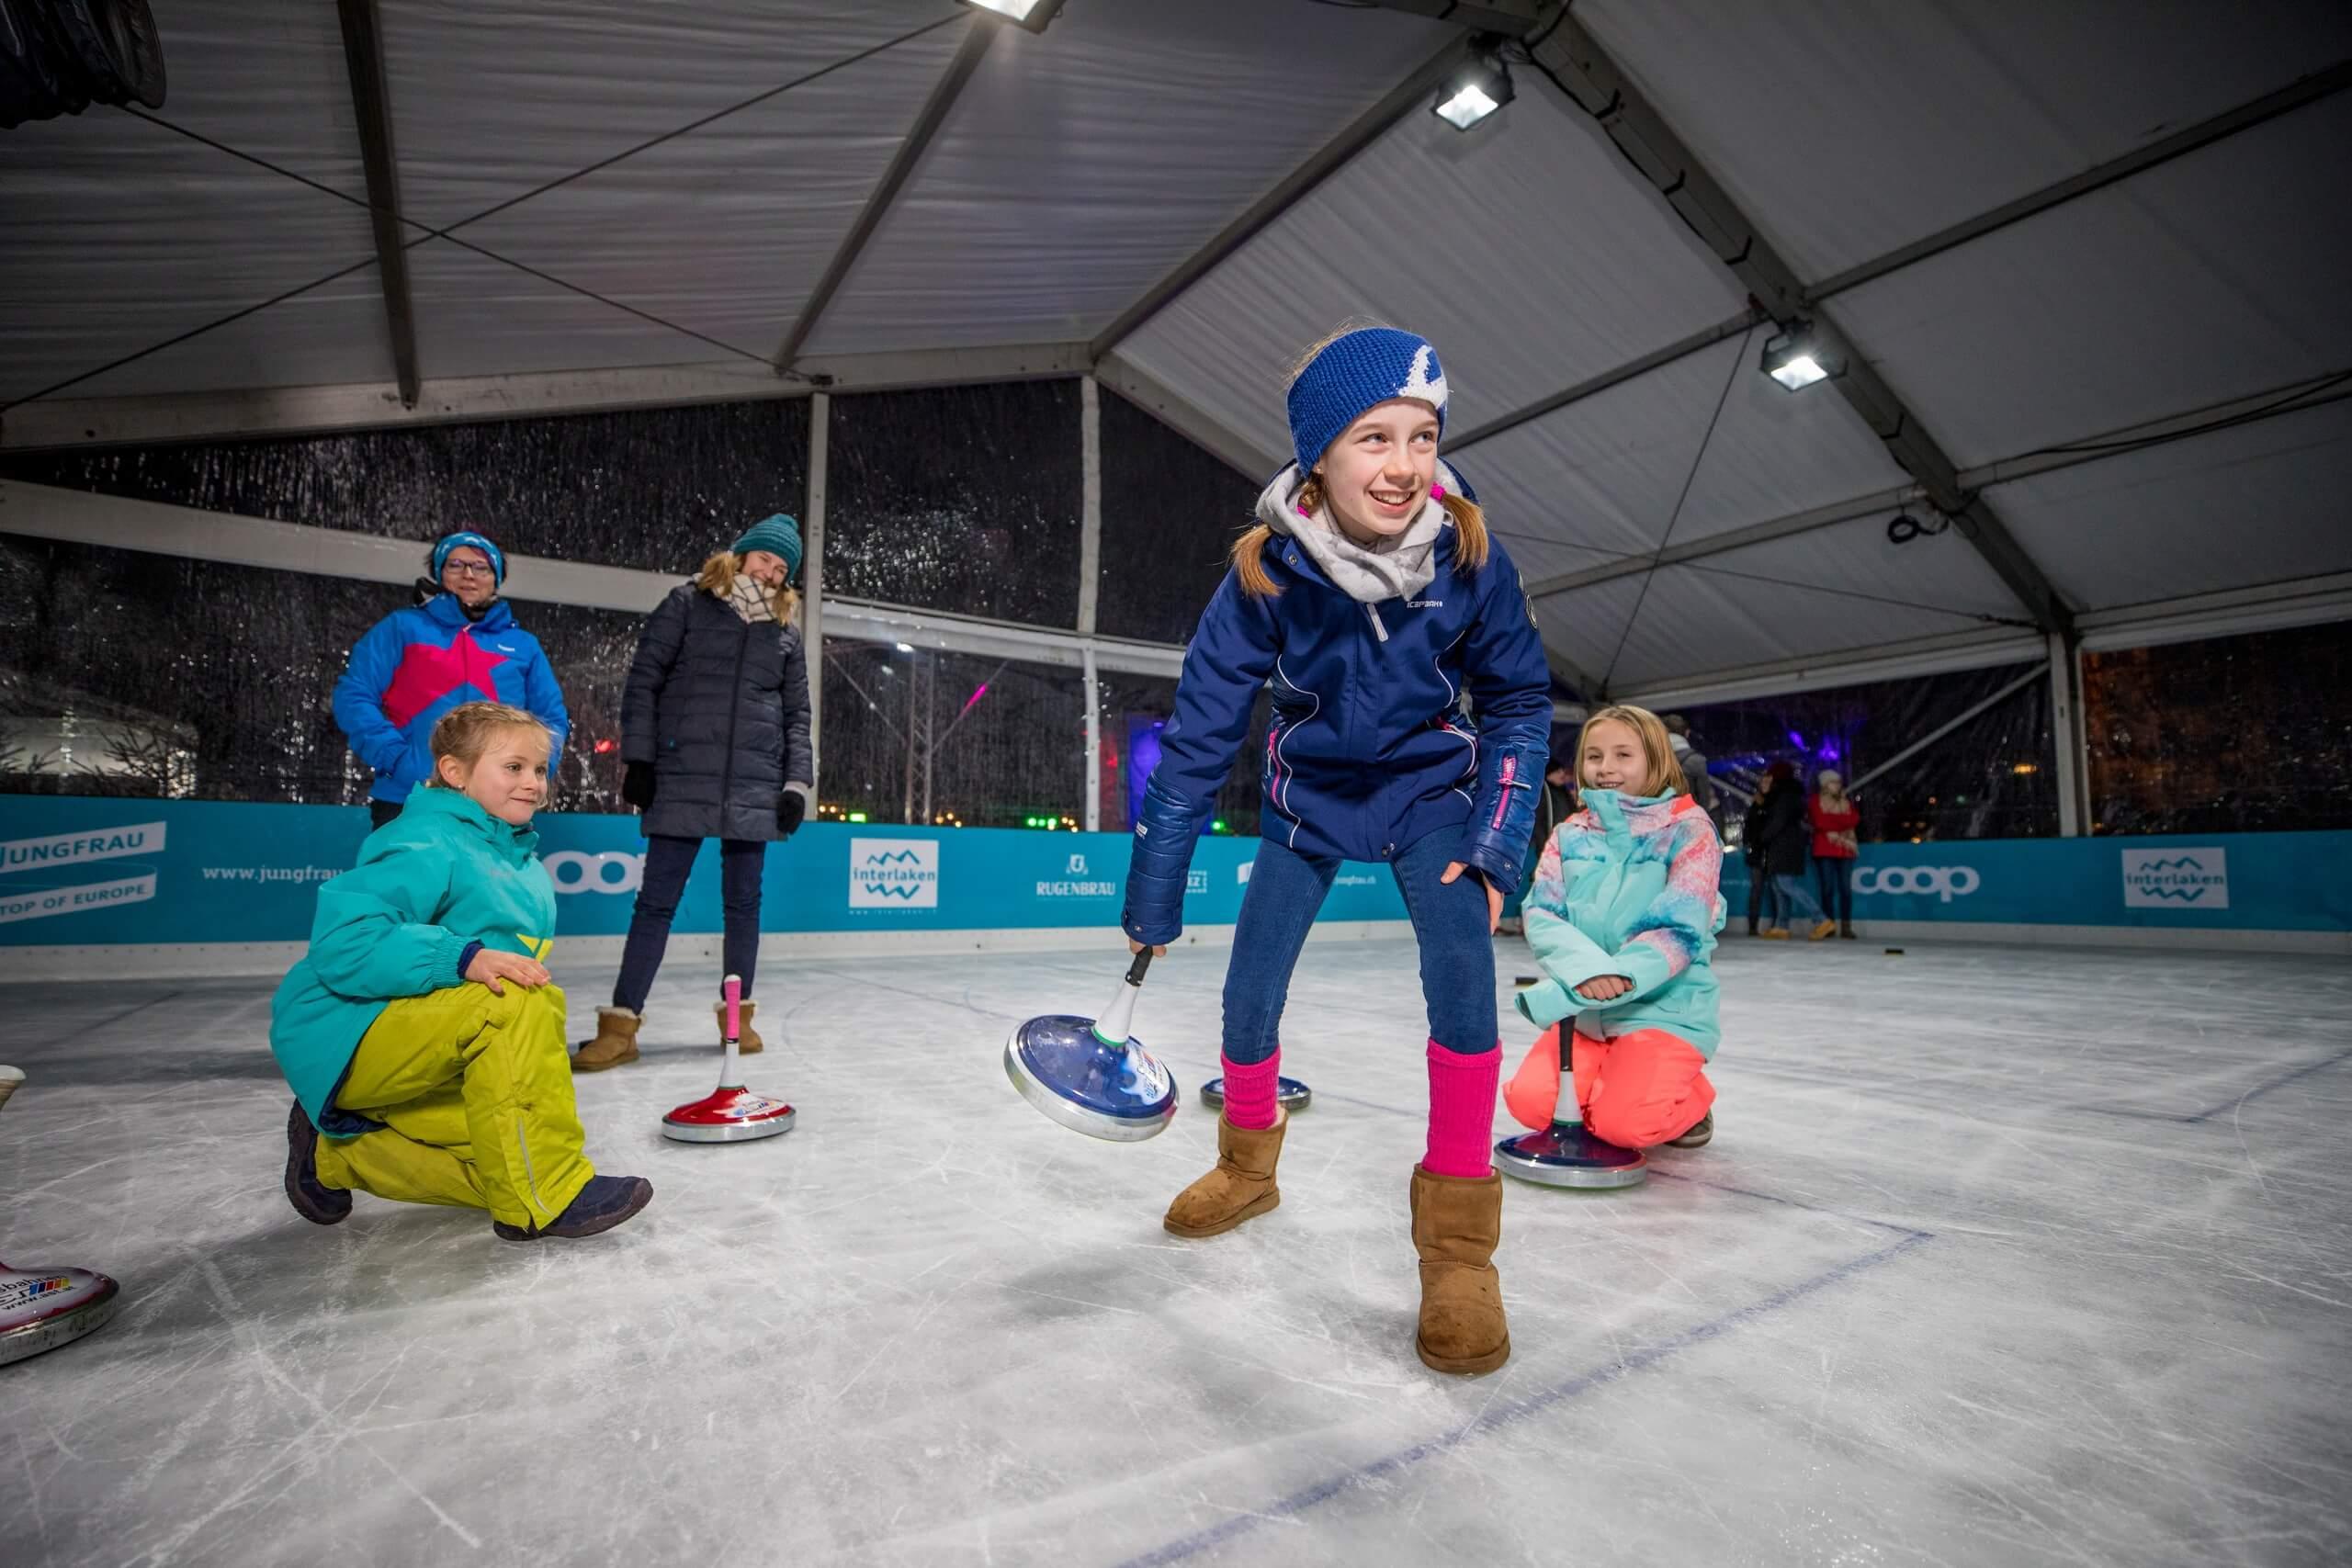 interlaken-top-of-europe-ice-magic-eisstockschiessen-winter-wintersport